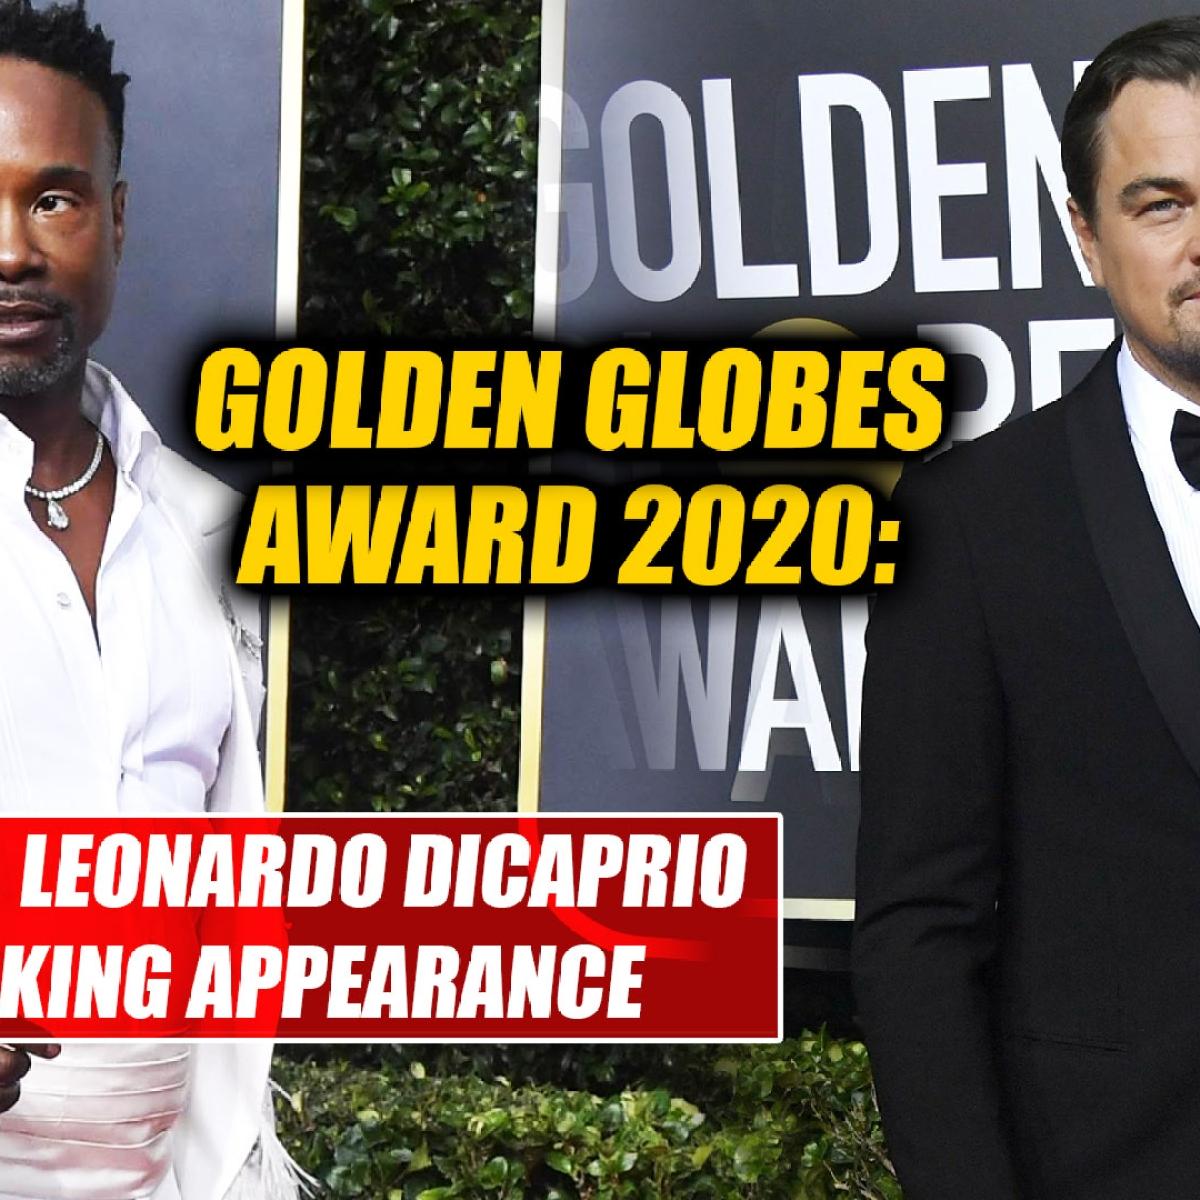 Golden Globes 2020: Billy Porter, Leonardo DiCaprio make striking appearance